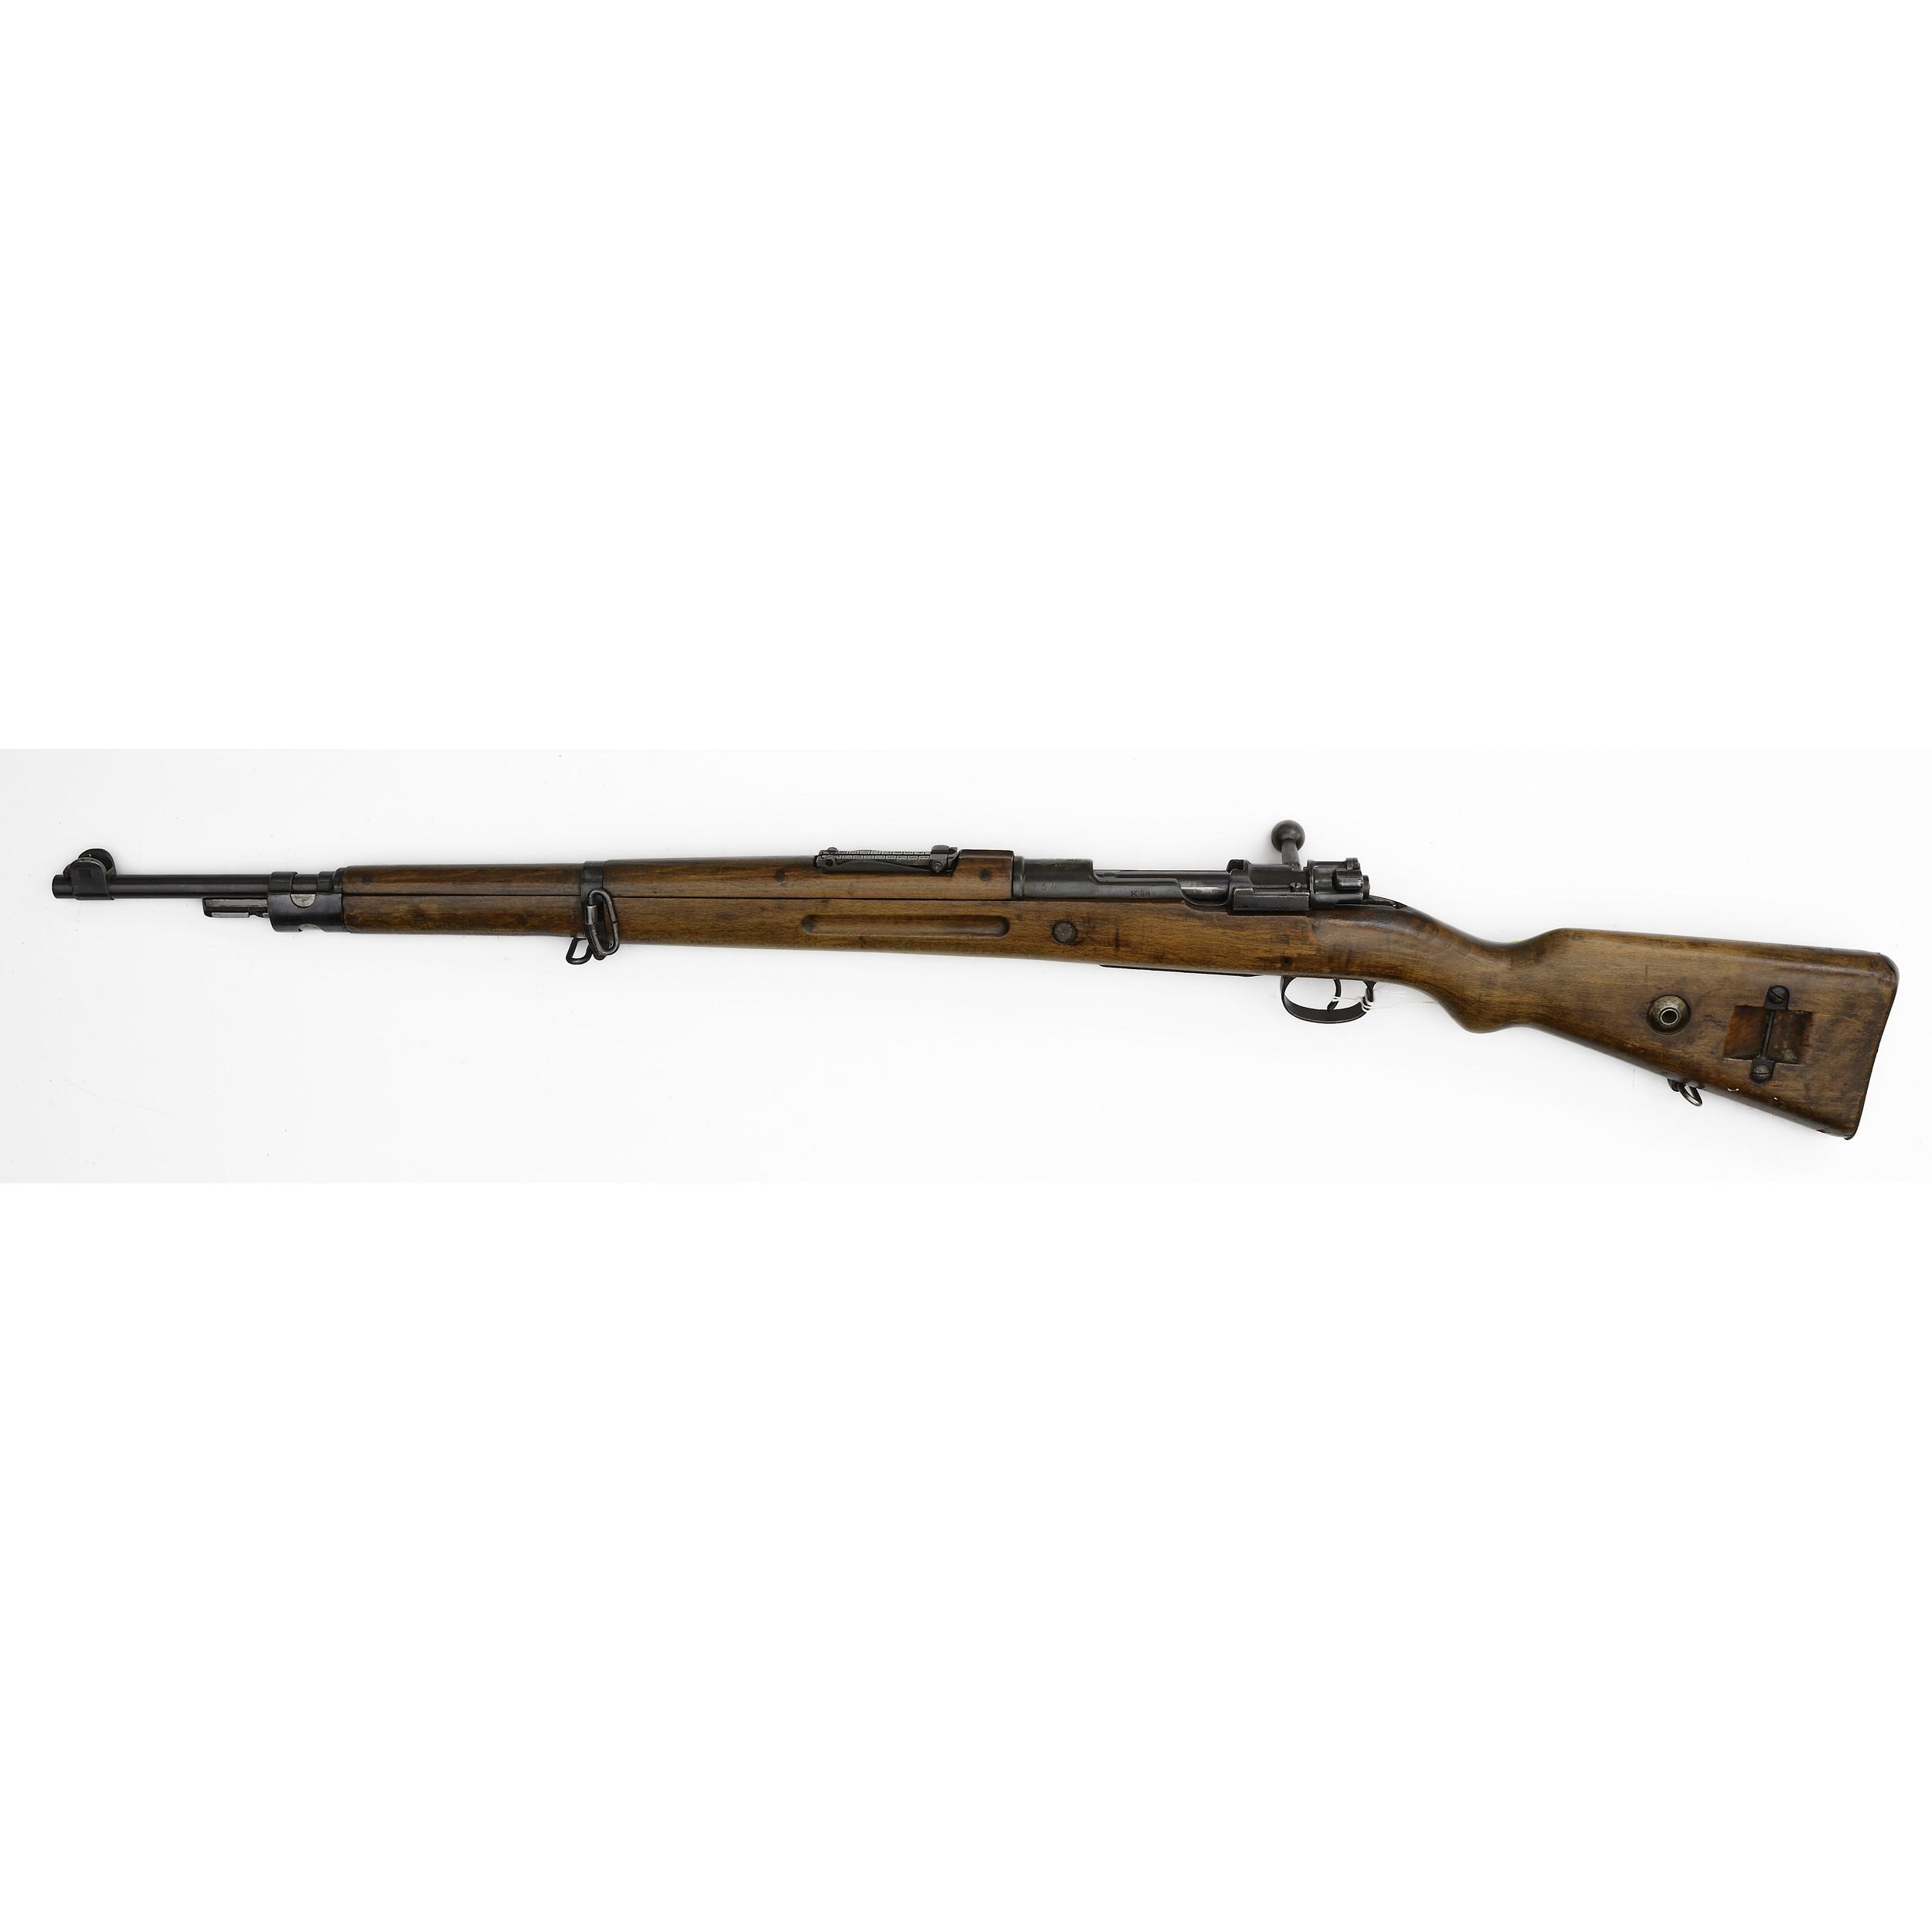 polish mauser k98 bolt action rifle cowan s auction house the